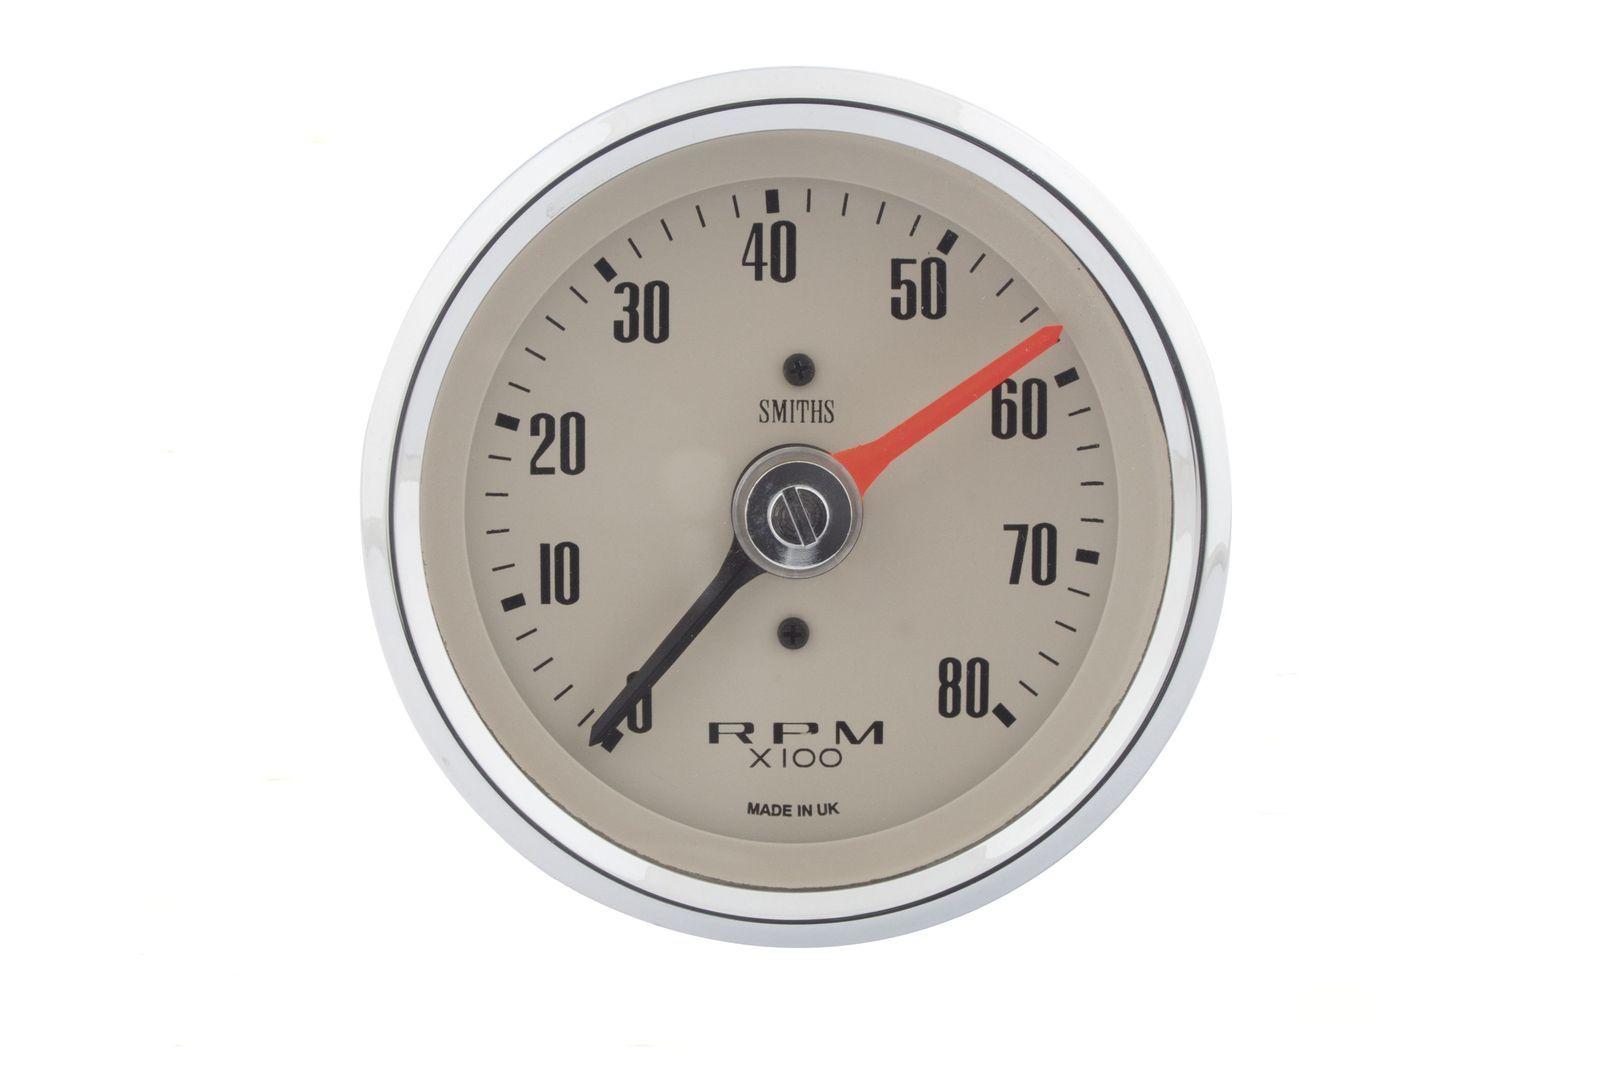 #Drehzahl-Instrument 80mm Dia. 0-8000 upm, helles Ziffernblatt, GAE0130M